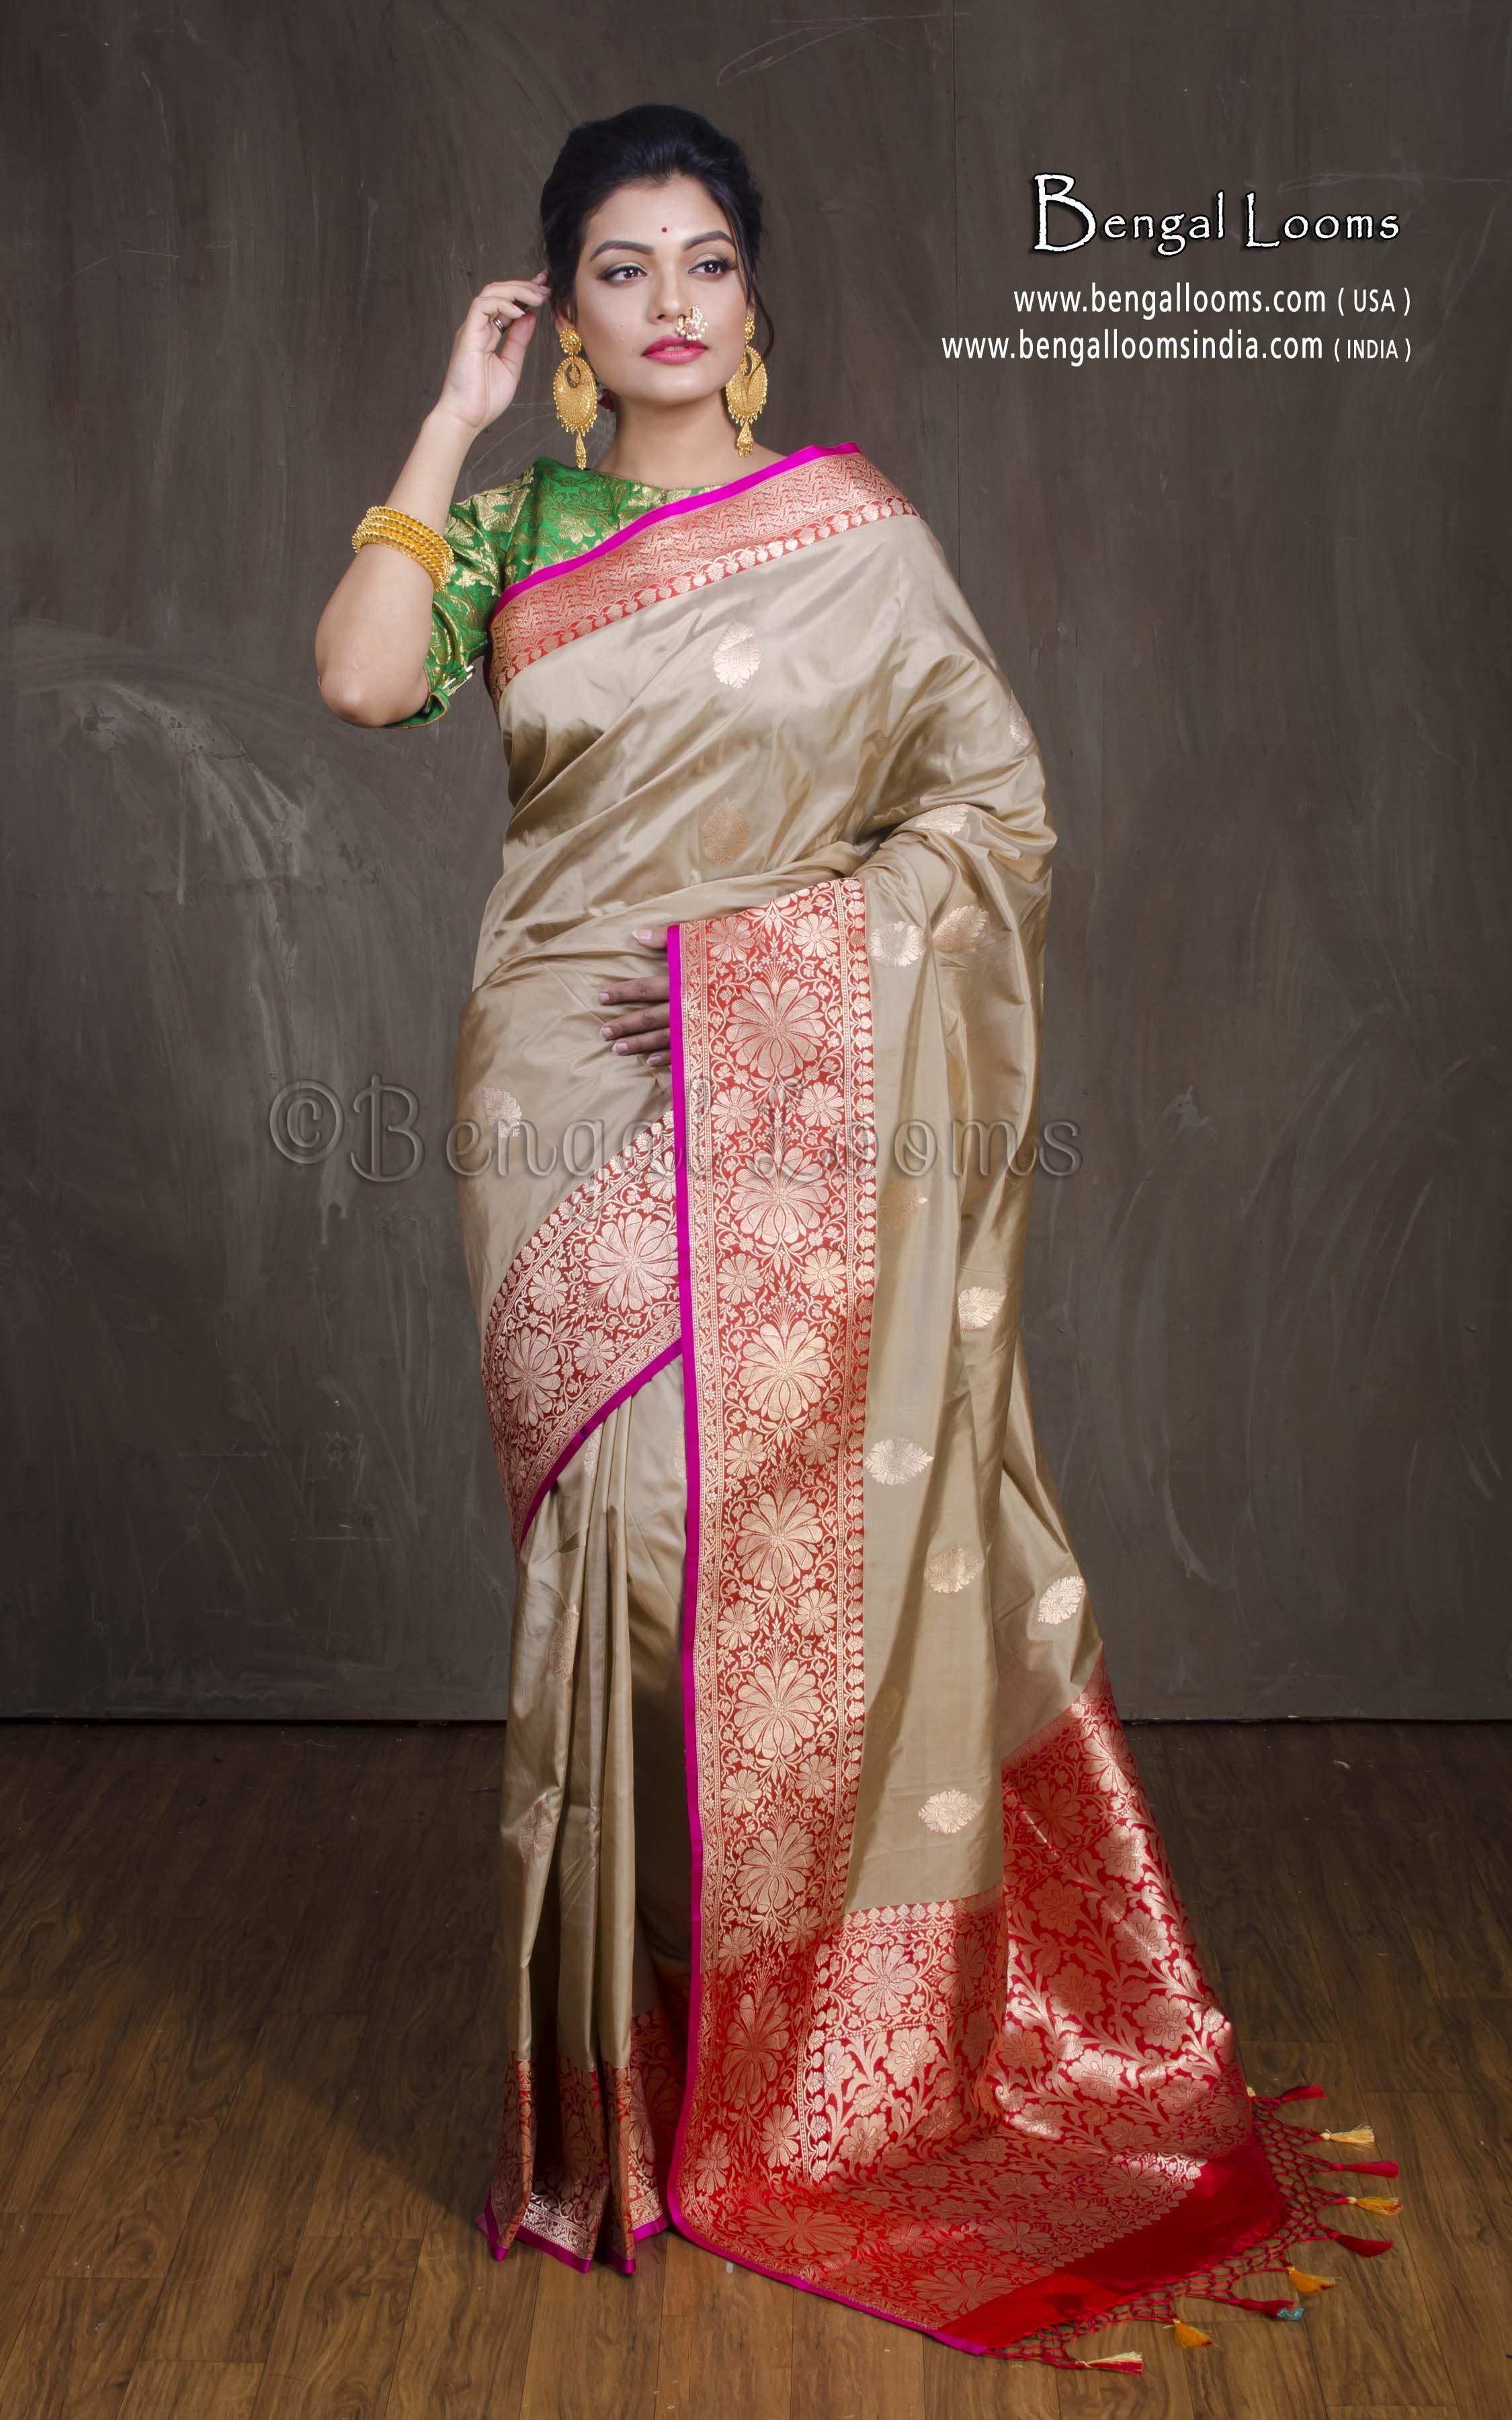 72ec6ced6e46b5 Pure Katan Silk Banarasi Saree in Clayish Cream and Red. Website -  www.bengallooms.com